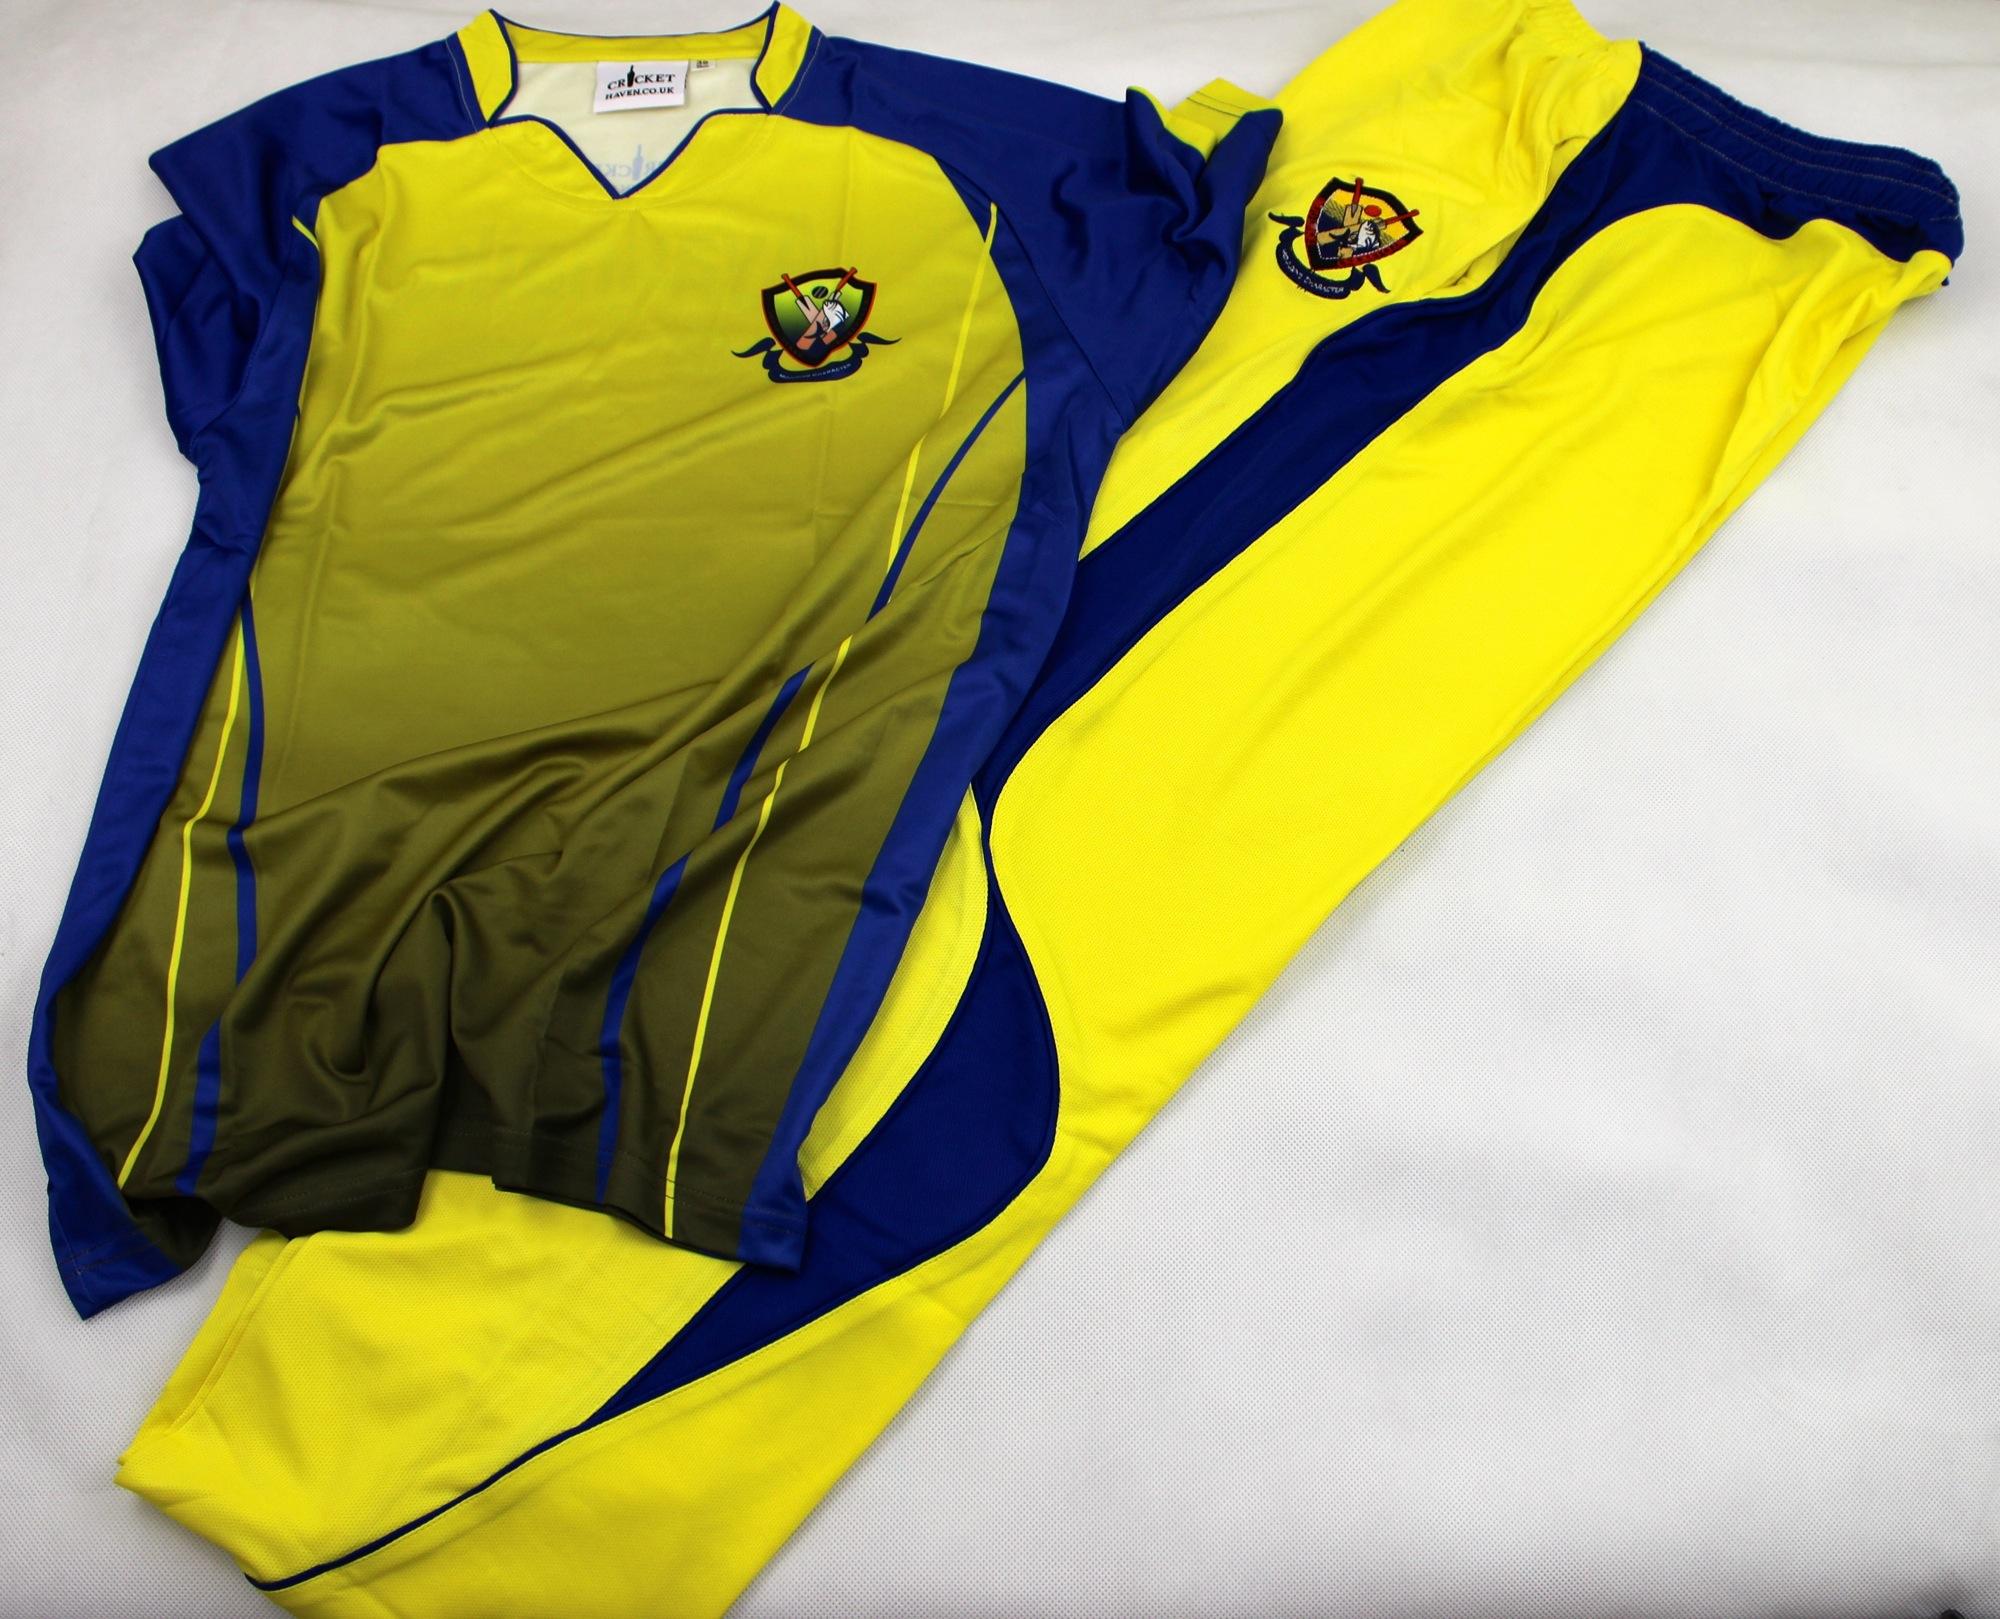 Design a t shirt kit - Image0990 Img0991 Img0992 Img0993